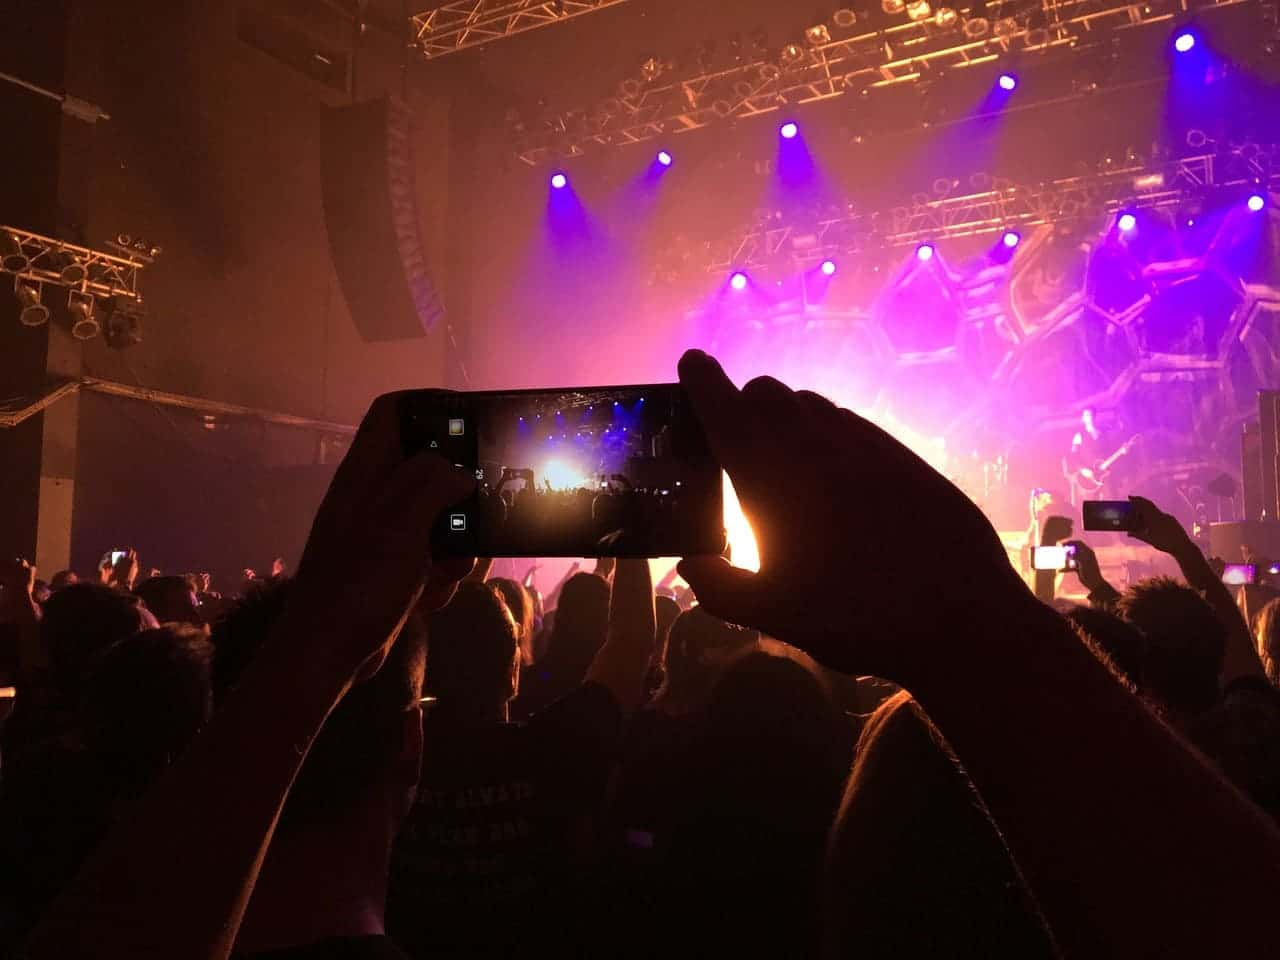 grabacion-video-android-mas-4gb